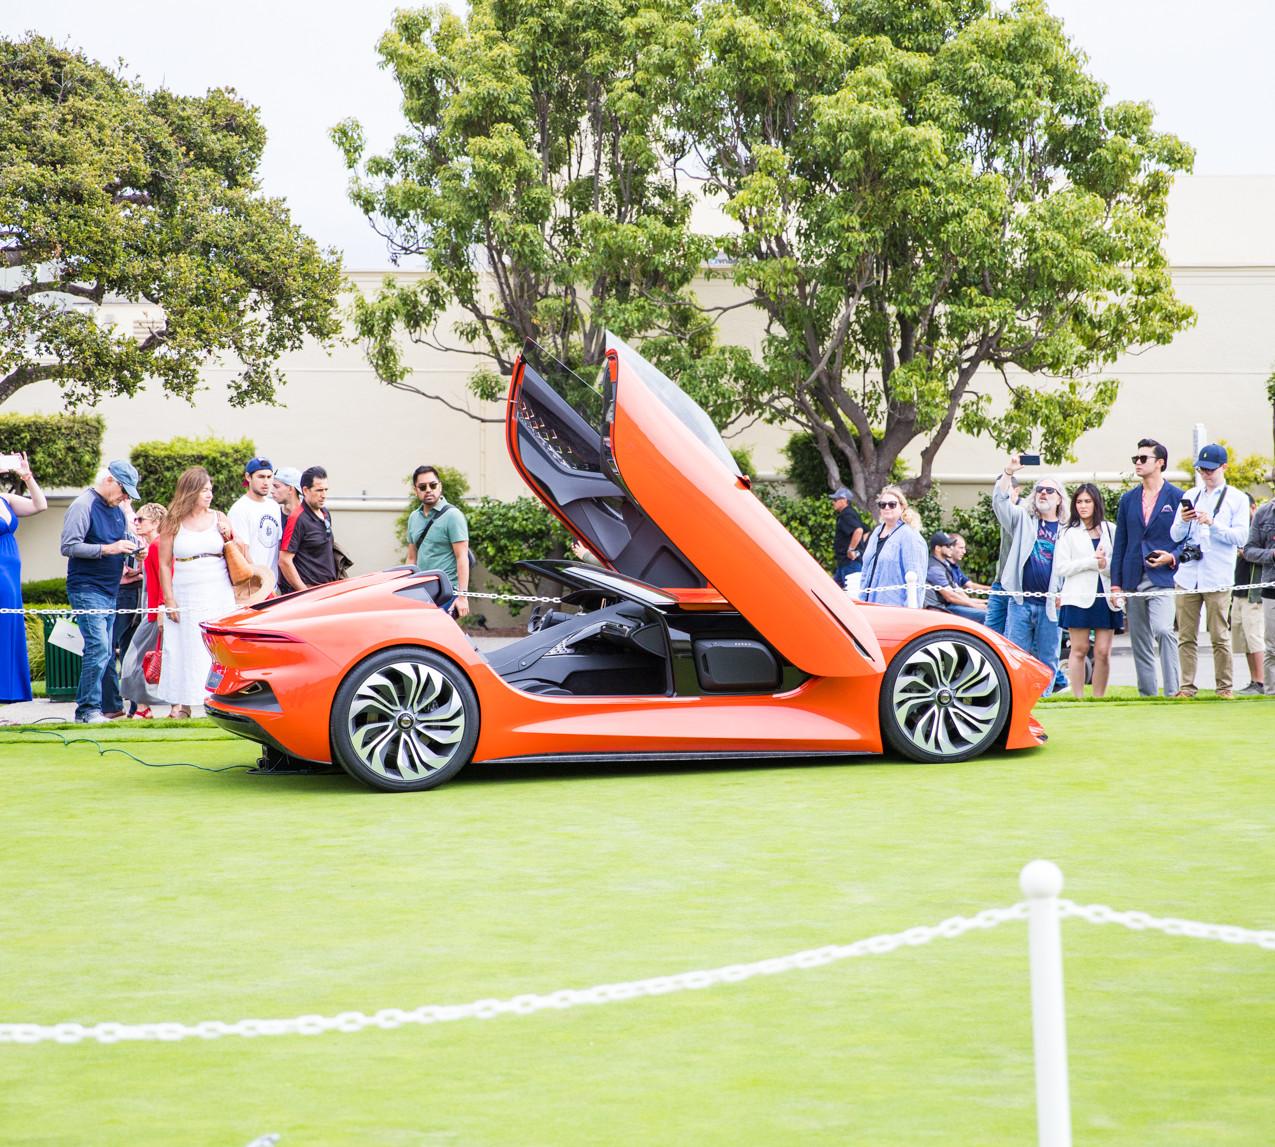 Karma Automotive's SC1 Vision